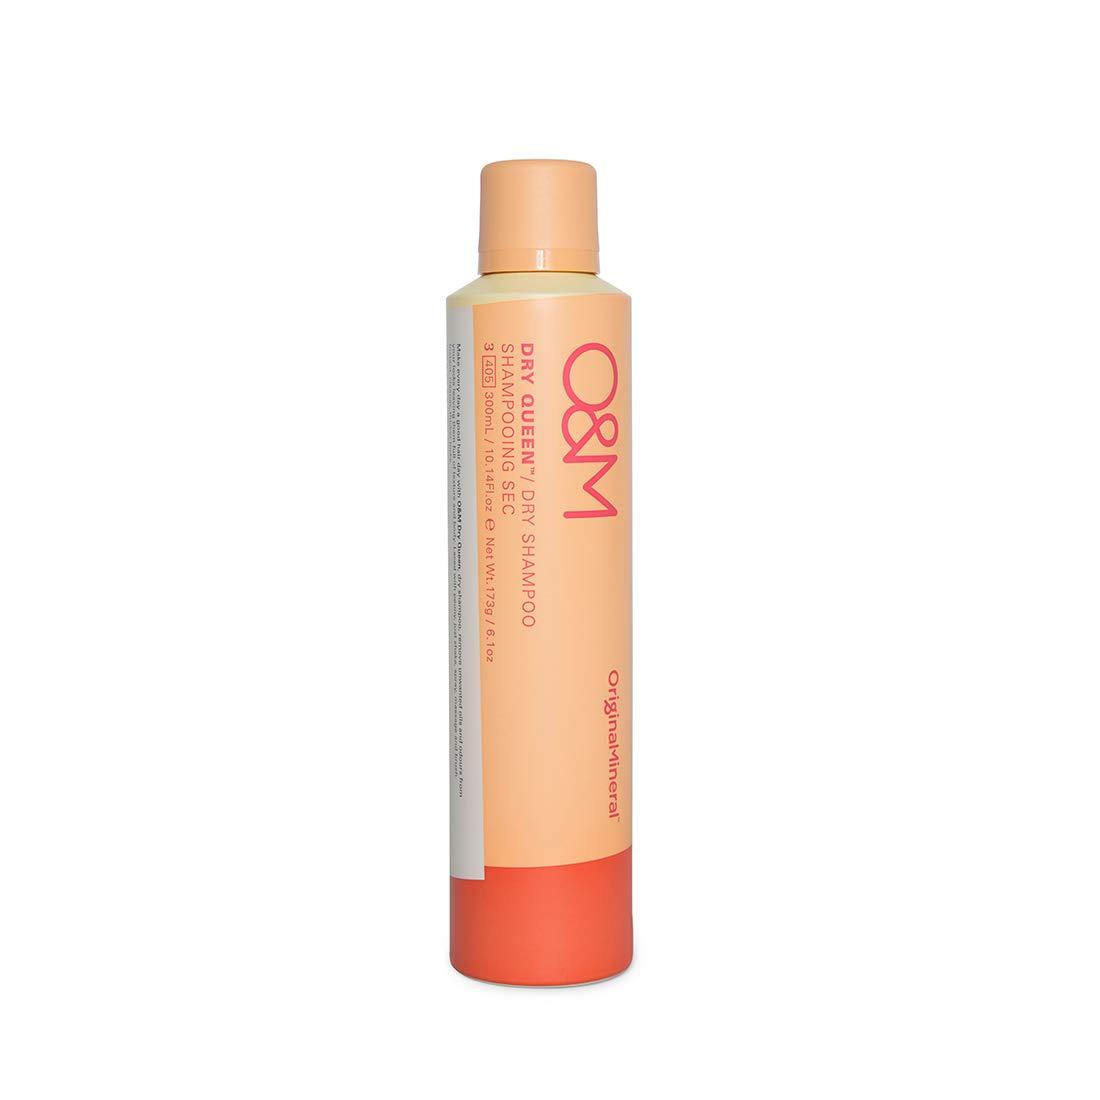 Original Mineral Dry Queen Dry Shampoo